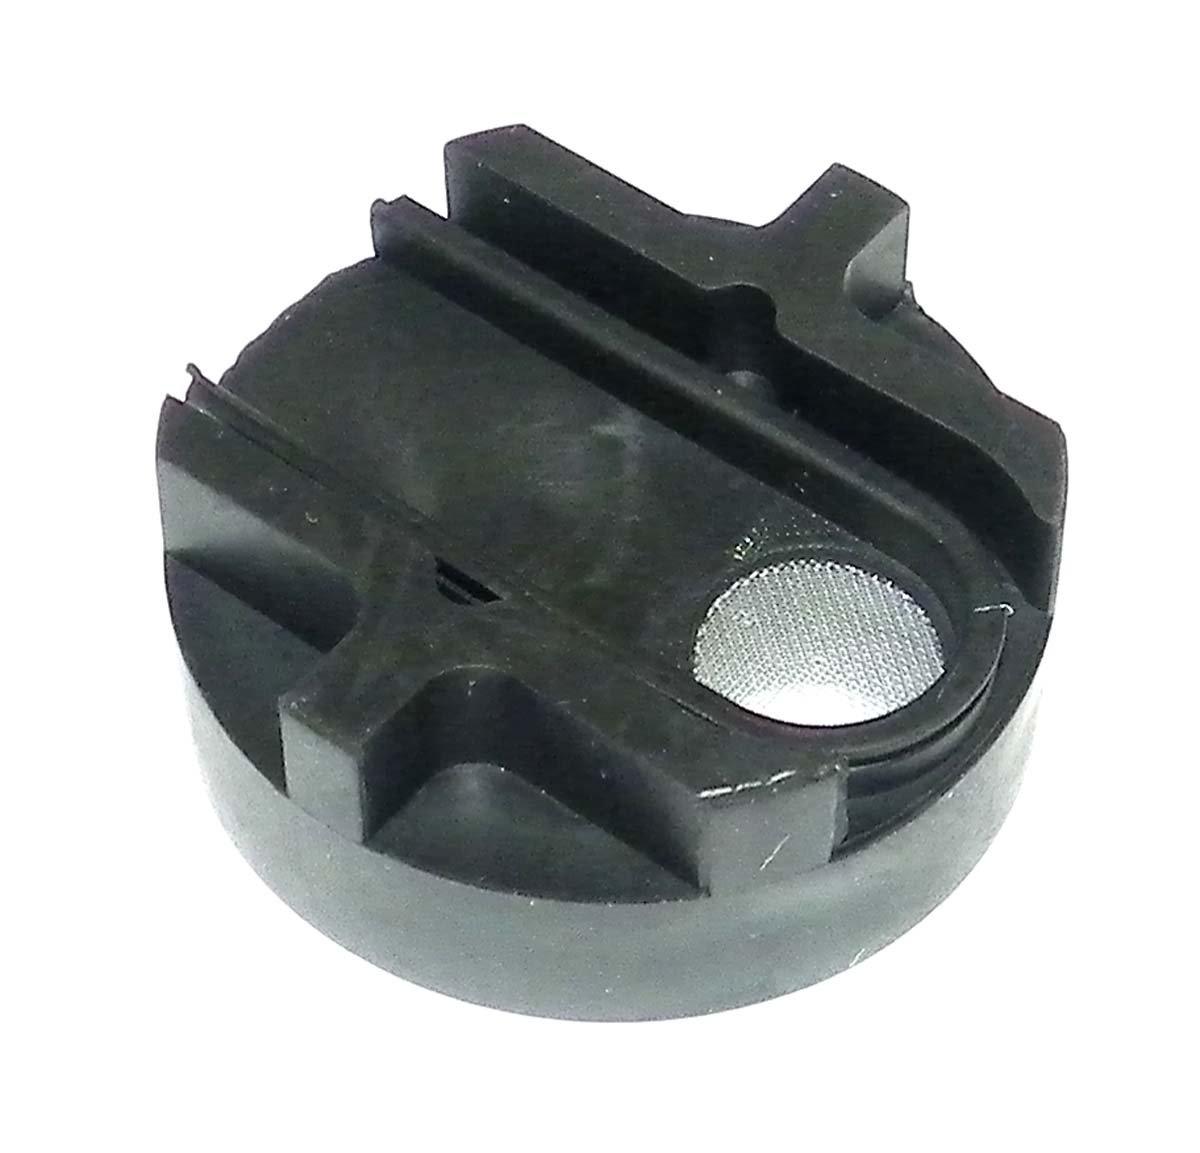 Mercury Fuel Filter Mercury VST Filter 115 EFI 4 Strokes WSM 600-294 OEM# 35-881323T by Pwc Engine